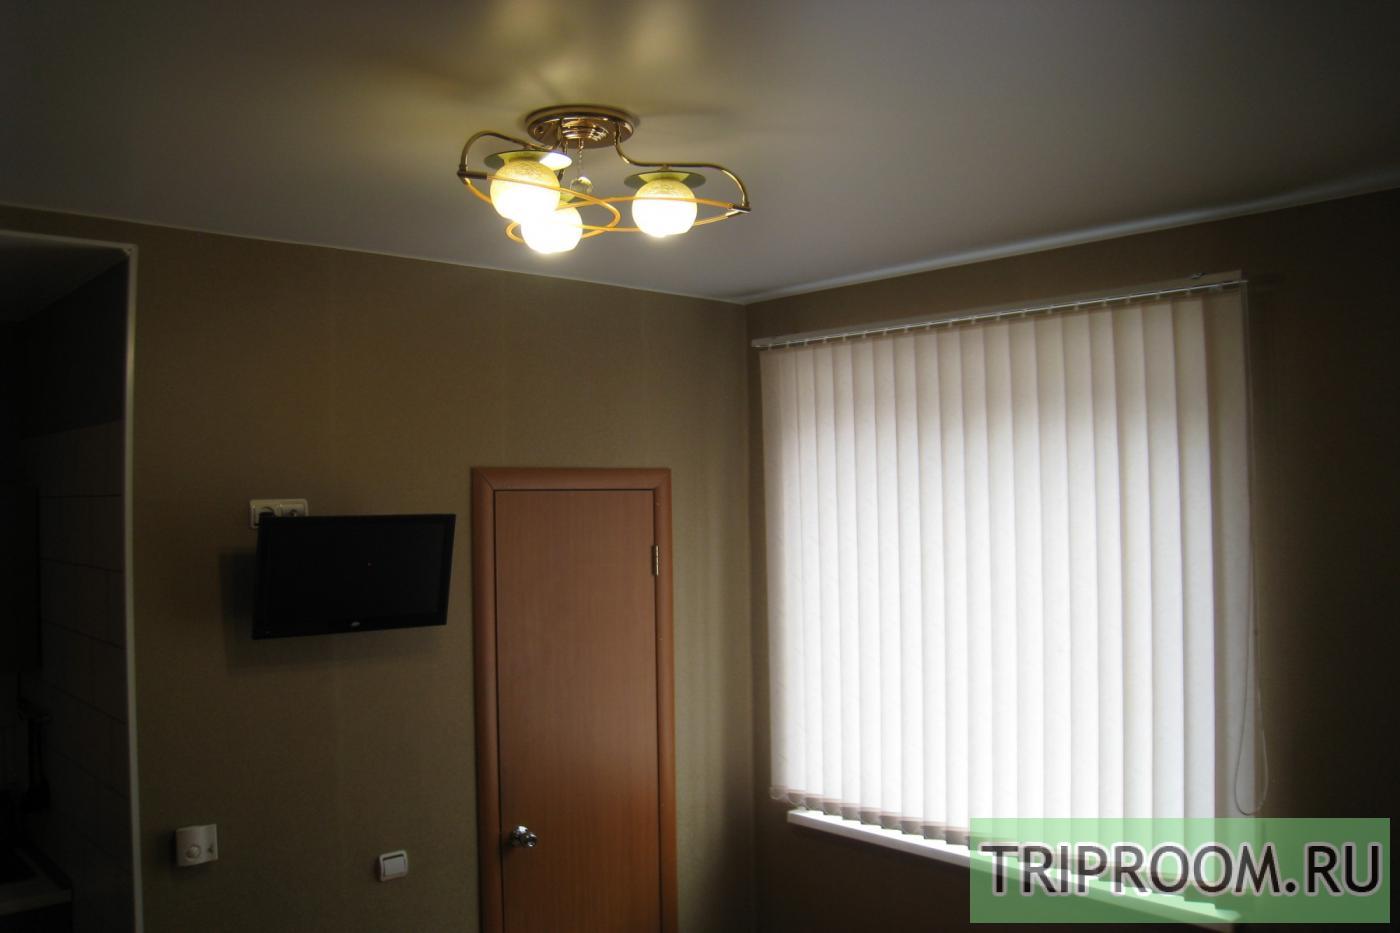 1-комнатная квартира посуточно (вариант № 22230), ул. Фрунзе улица, фото № 2